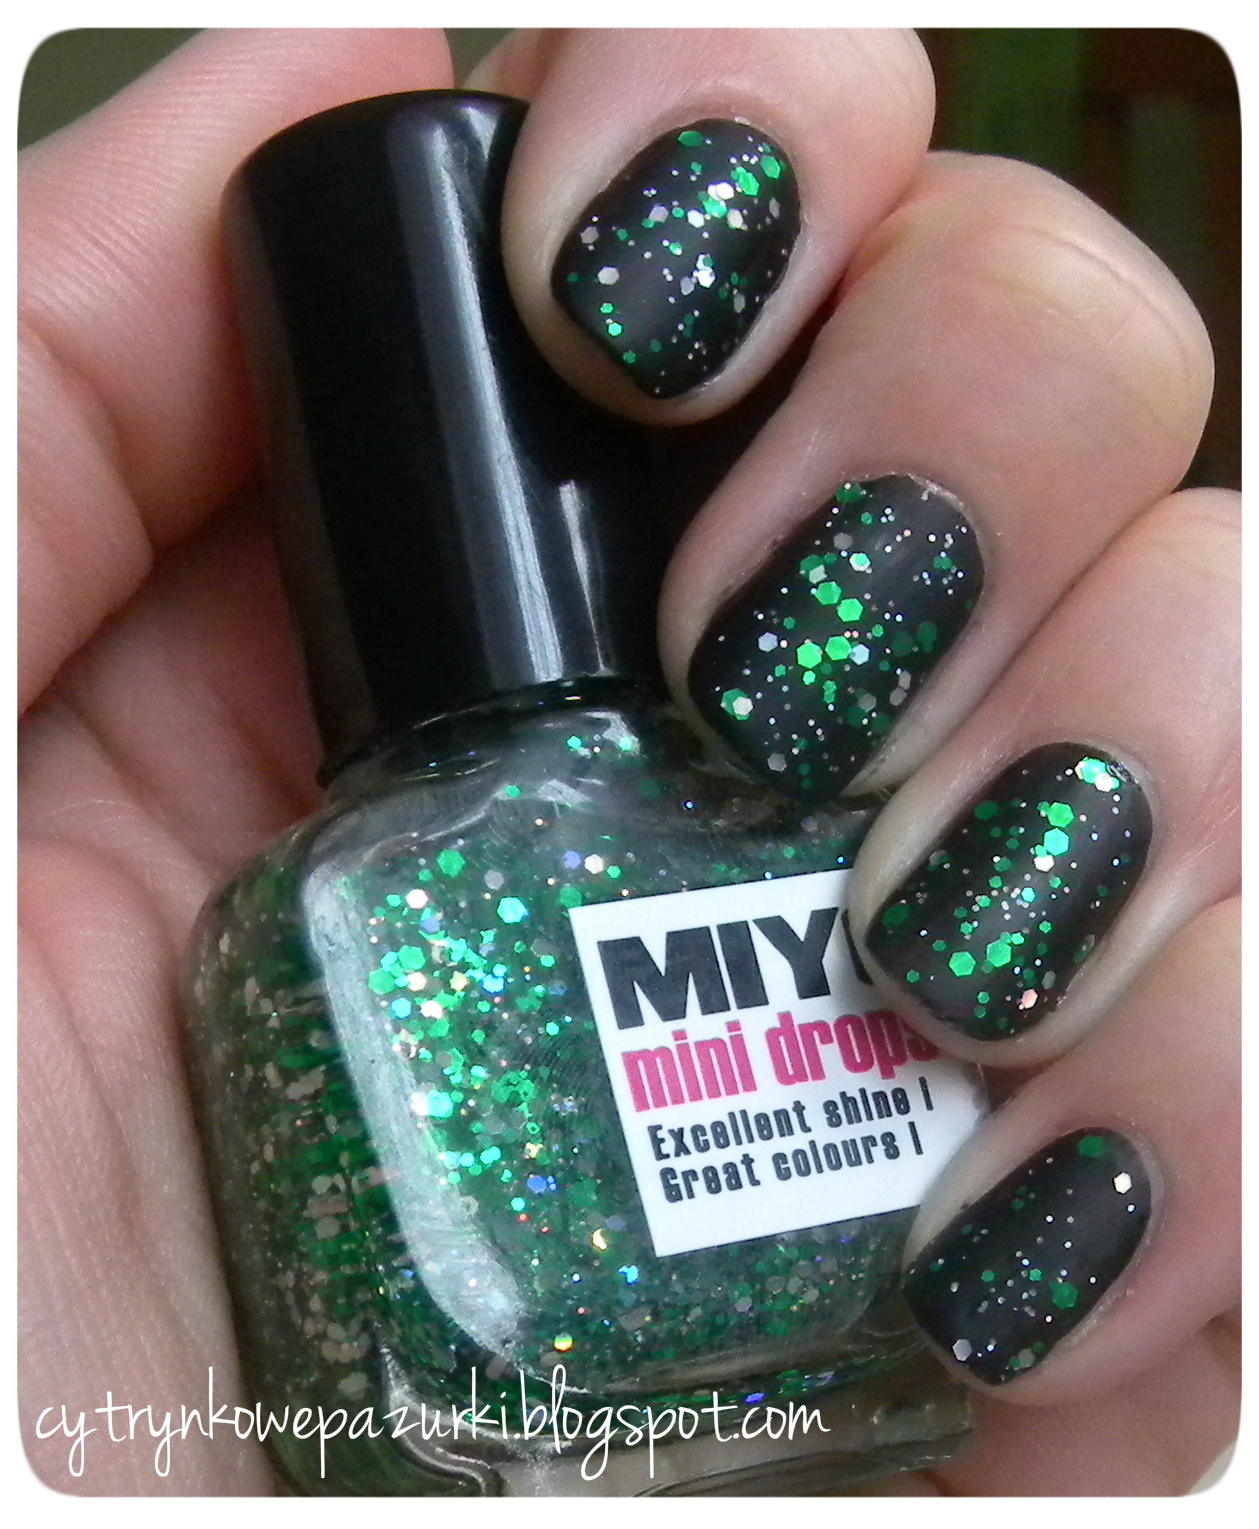 Miyo Mini Drops 153 green fireworks